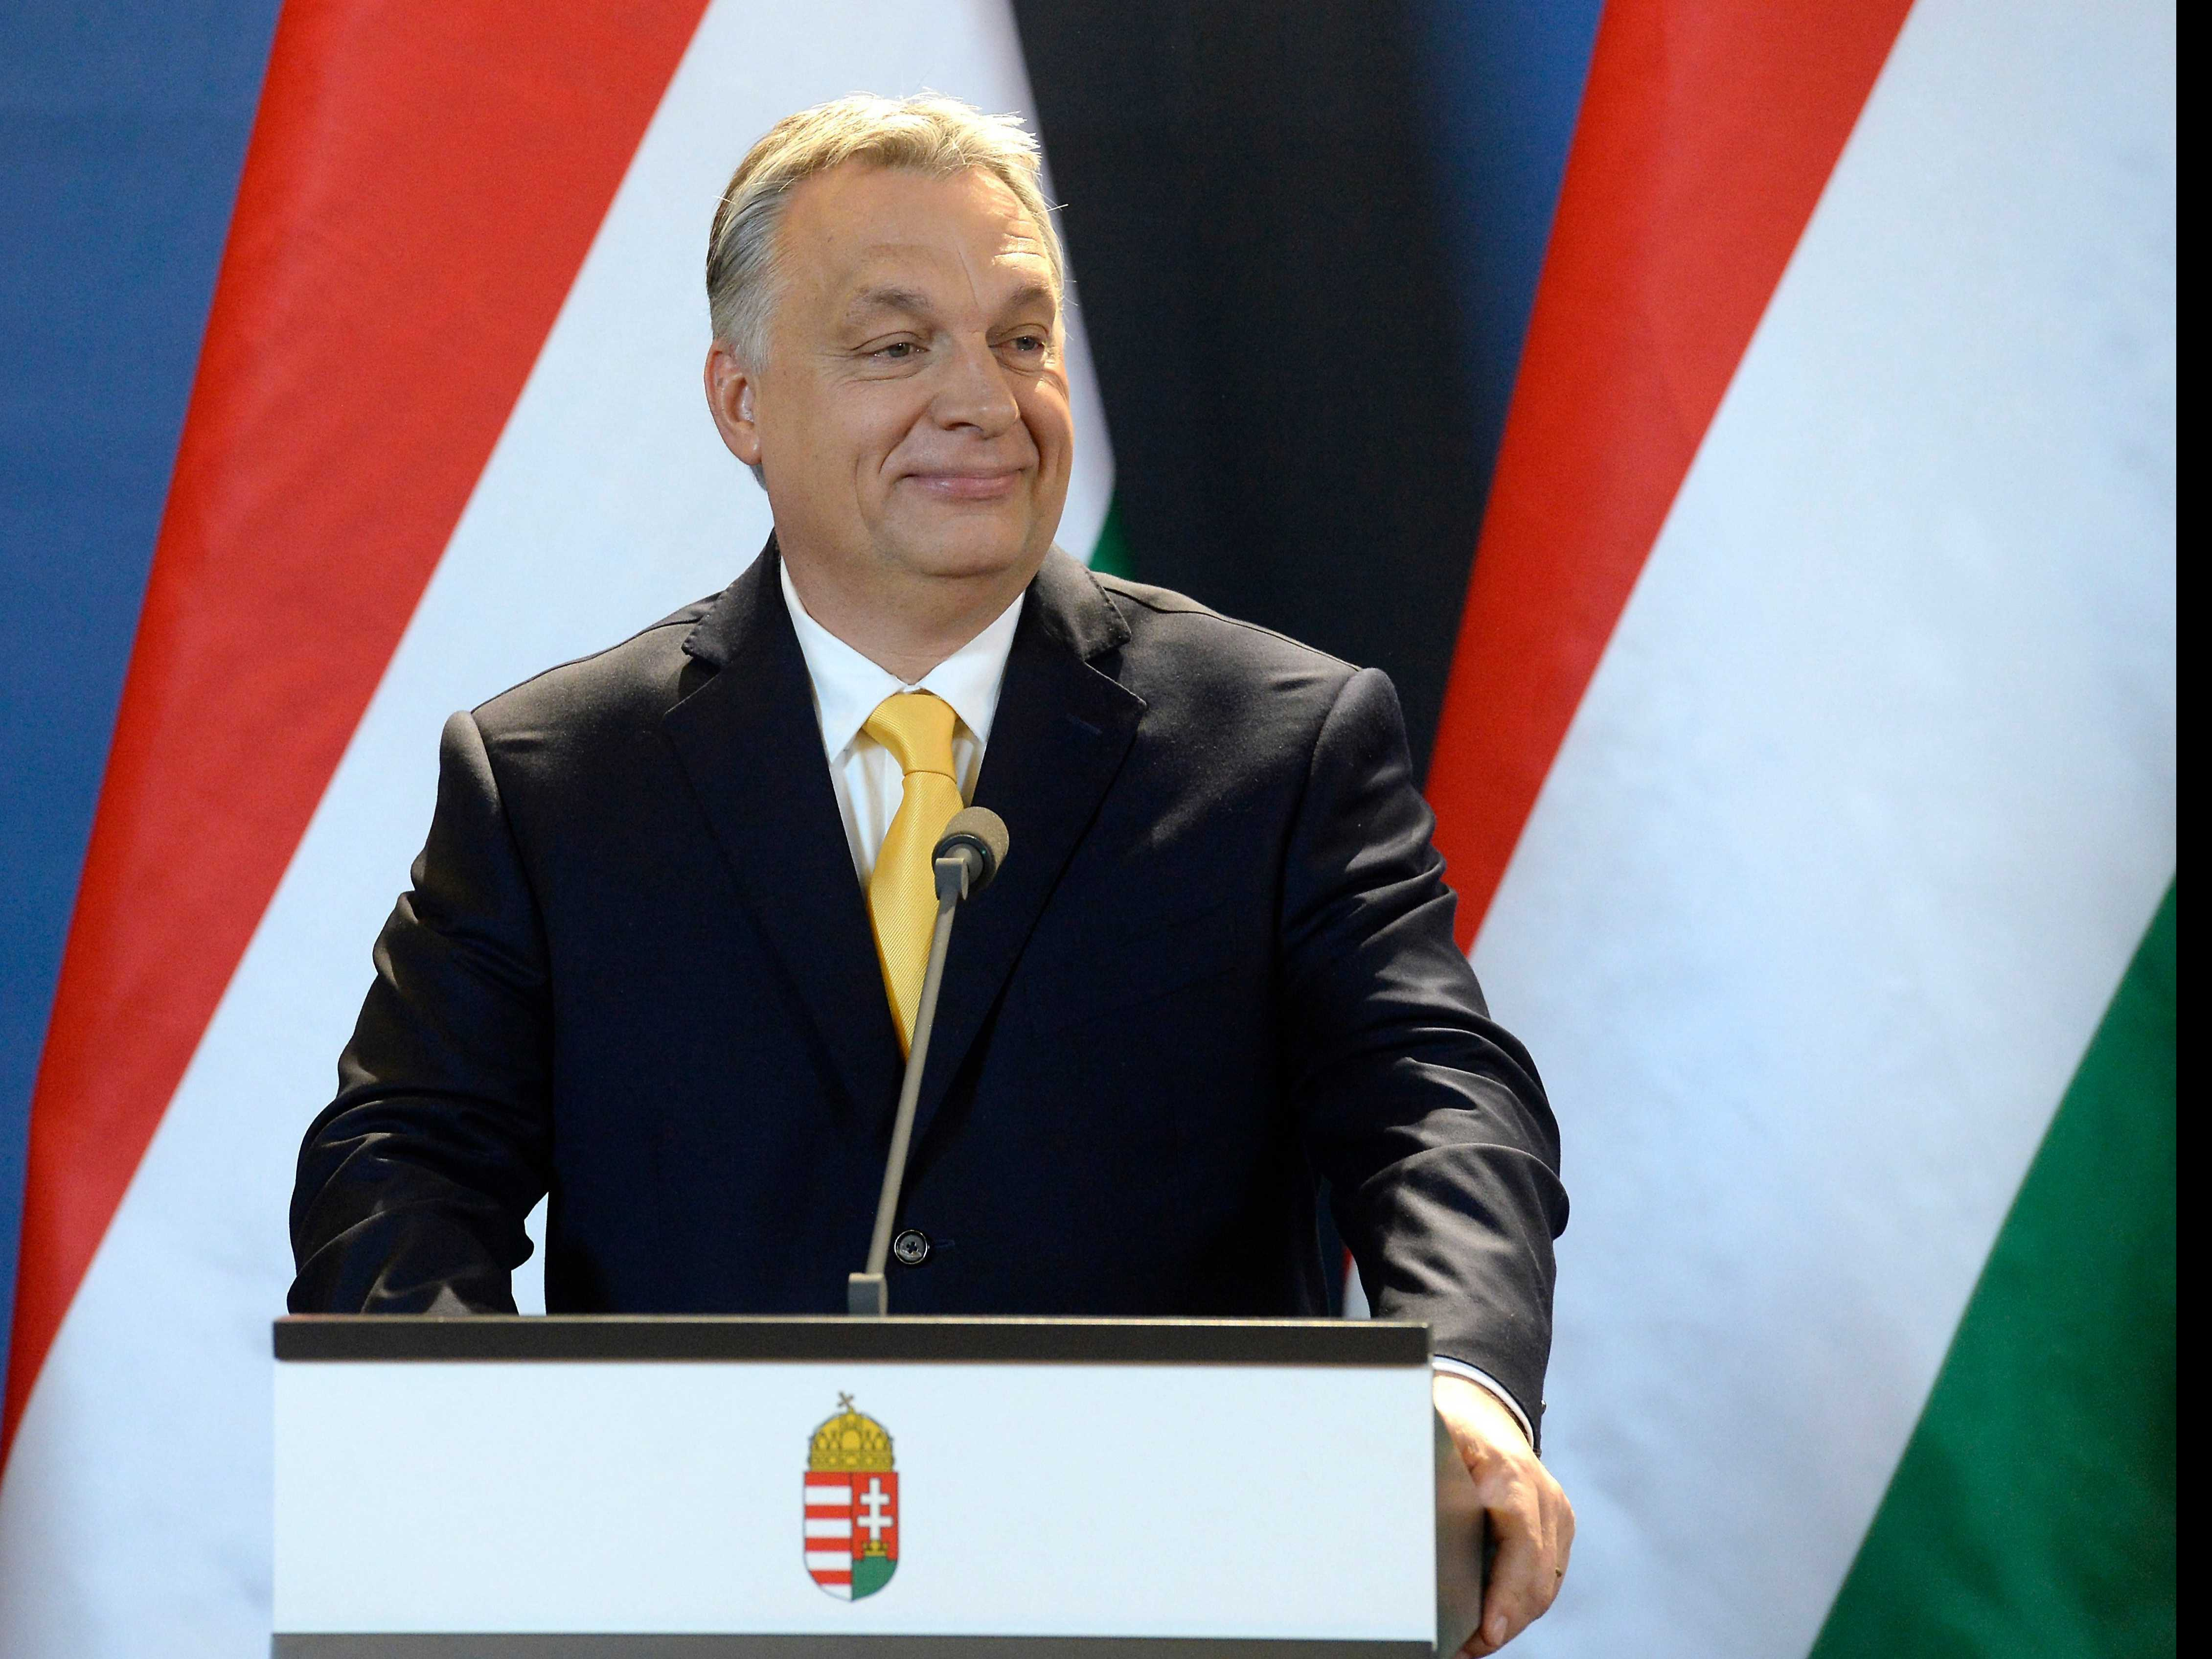 Hungary: Pro-Govt Weekly Prints List of 'Soros Mercenaries'